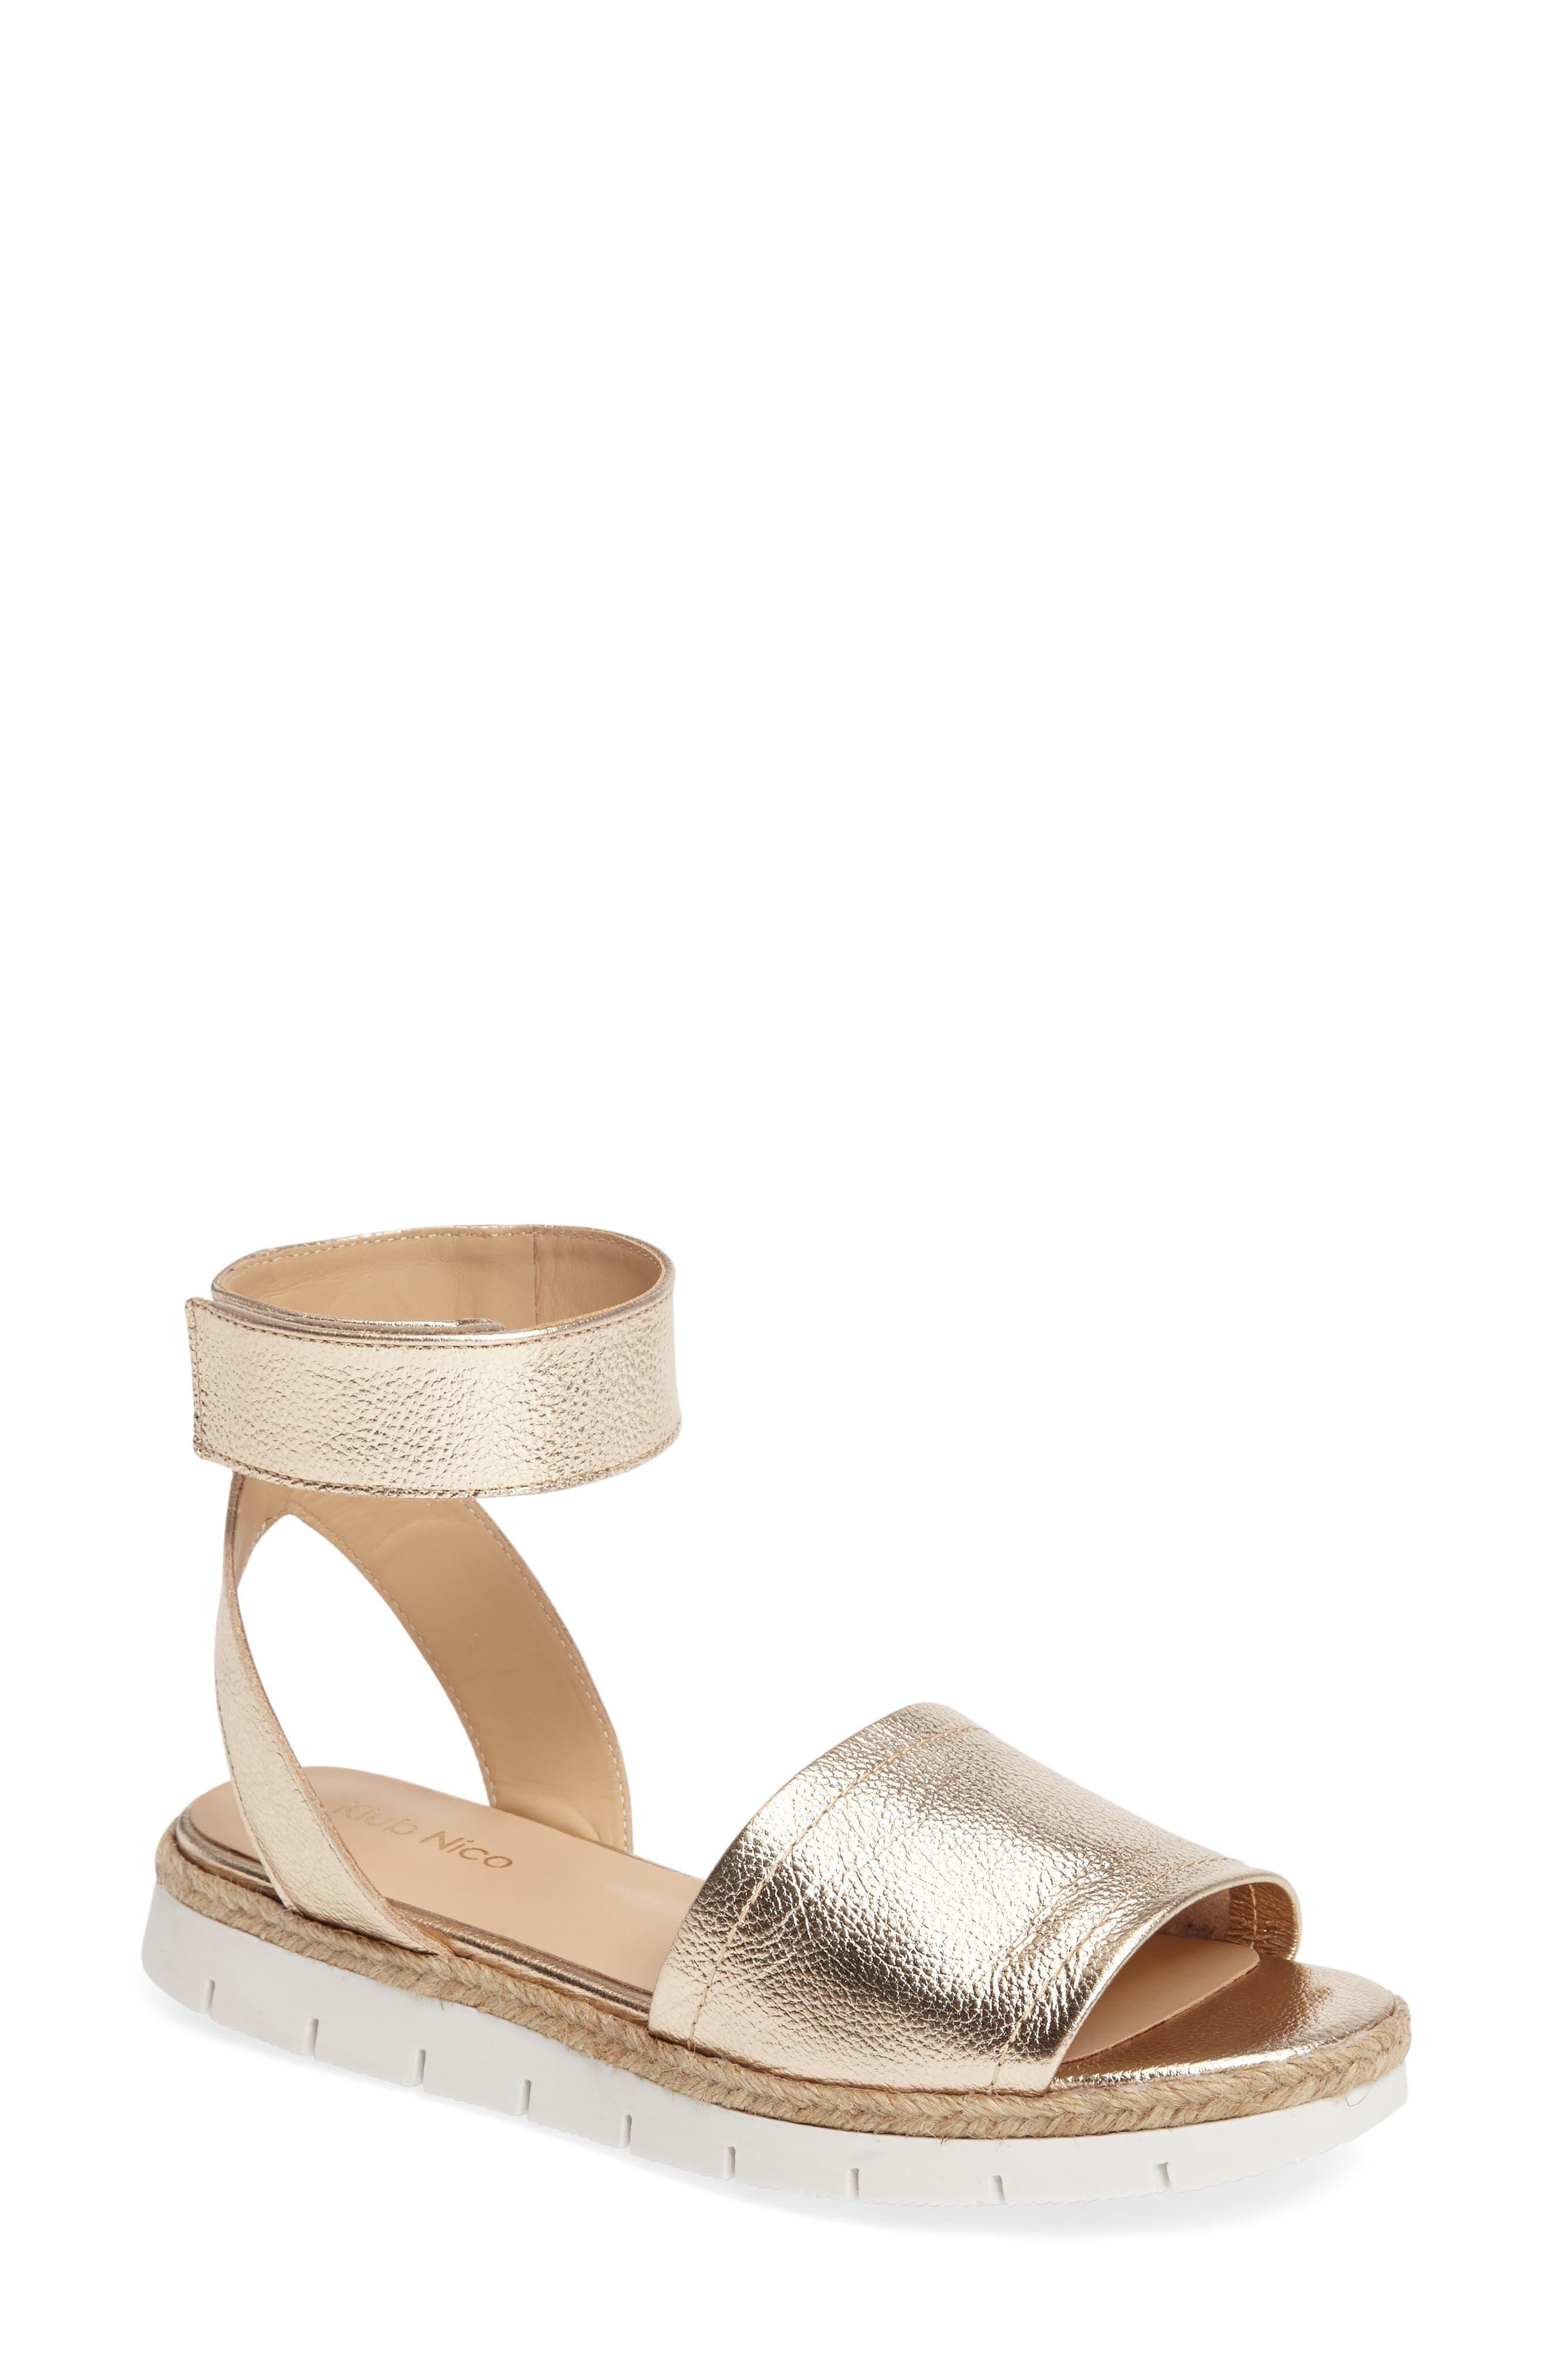 Cleo Platform Sandal,                             Main thumbnail 3, color,